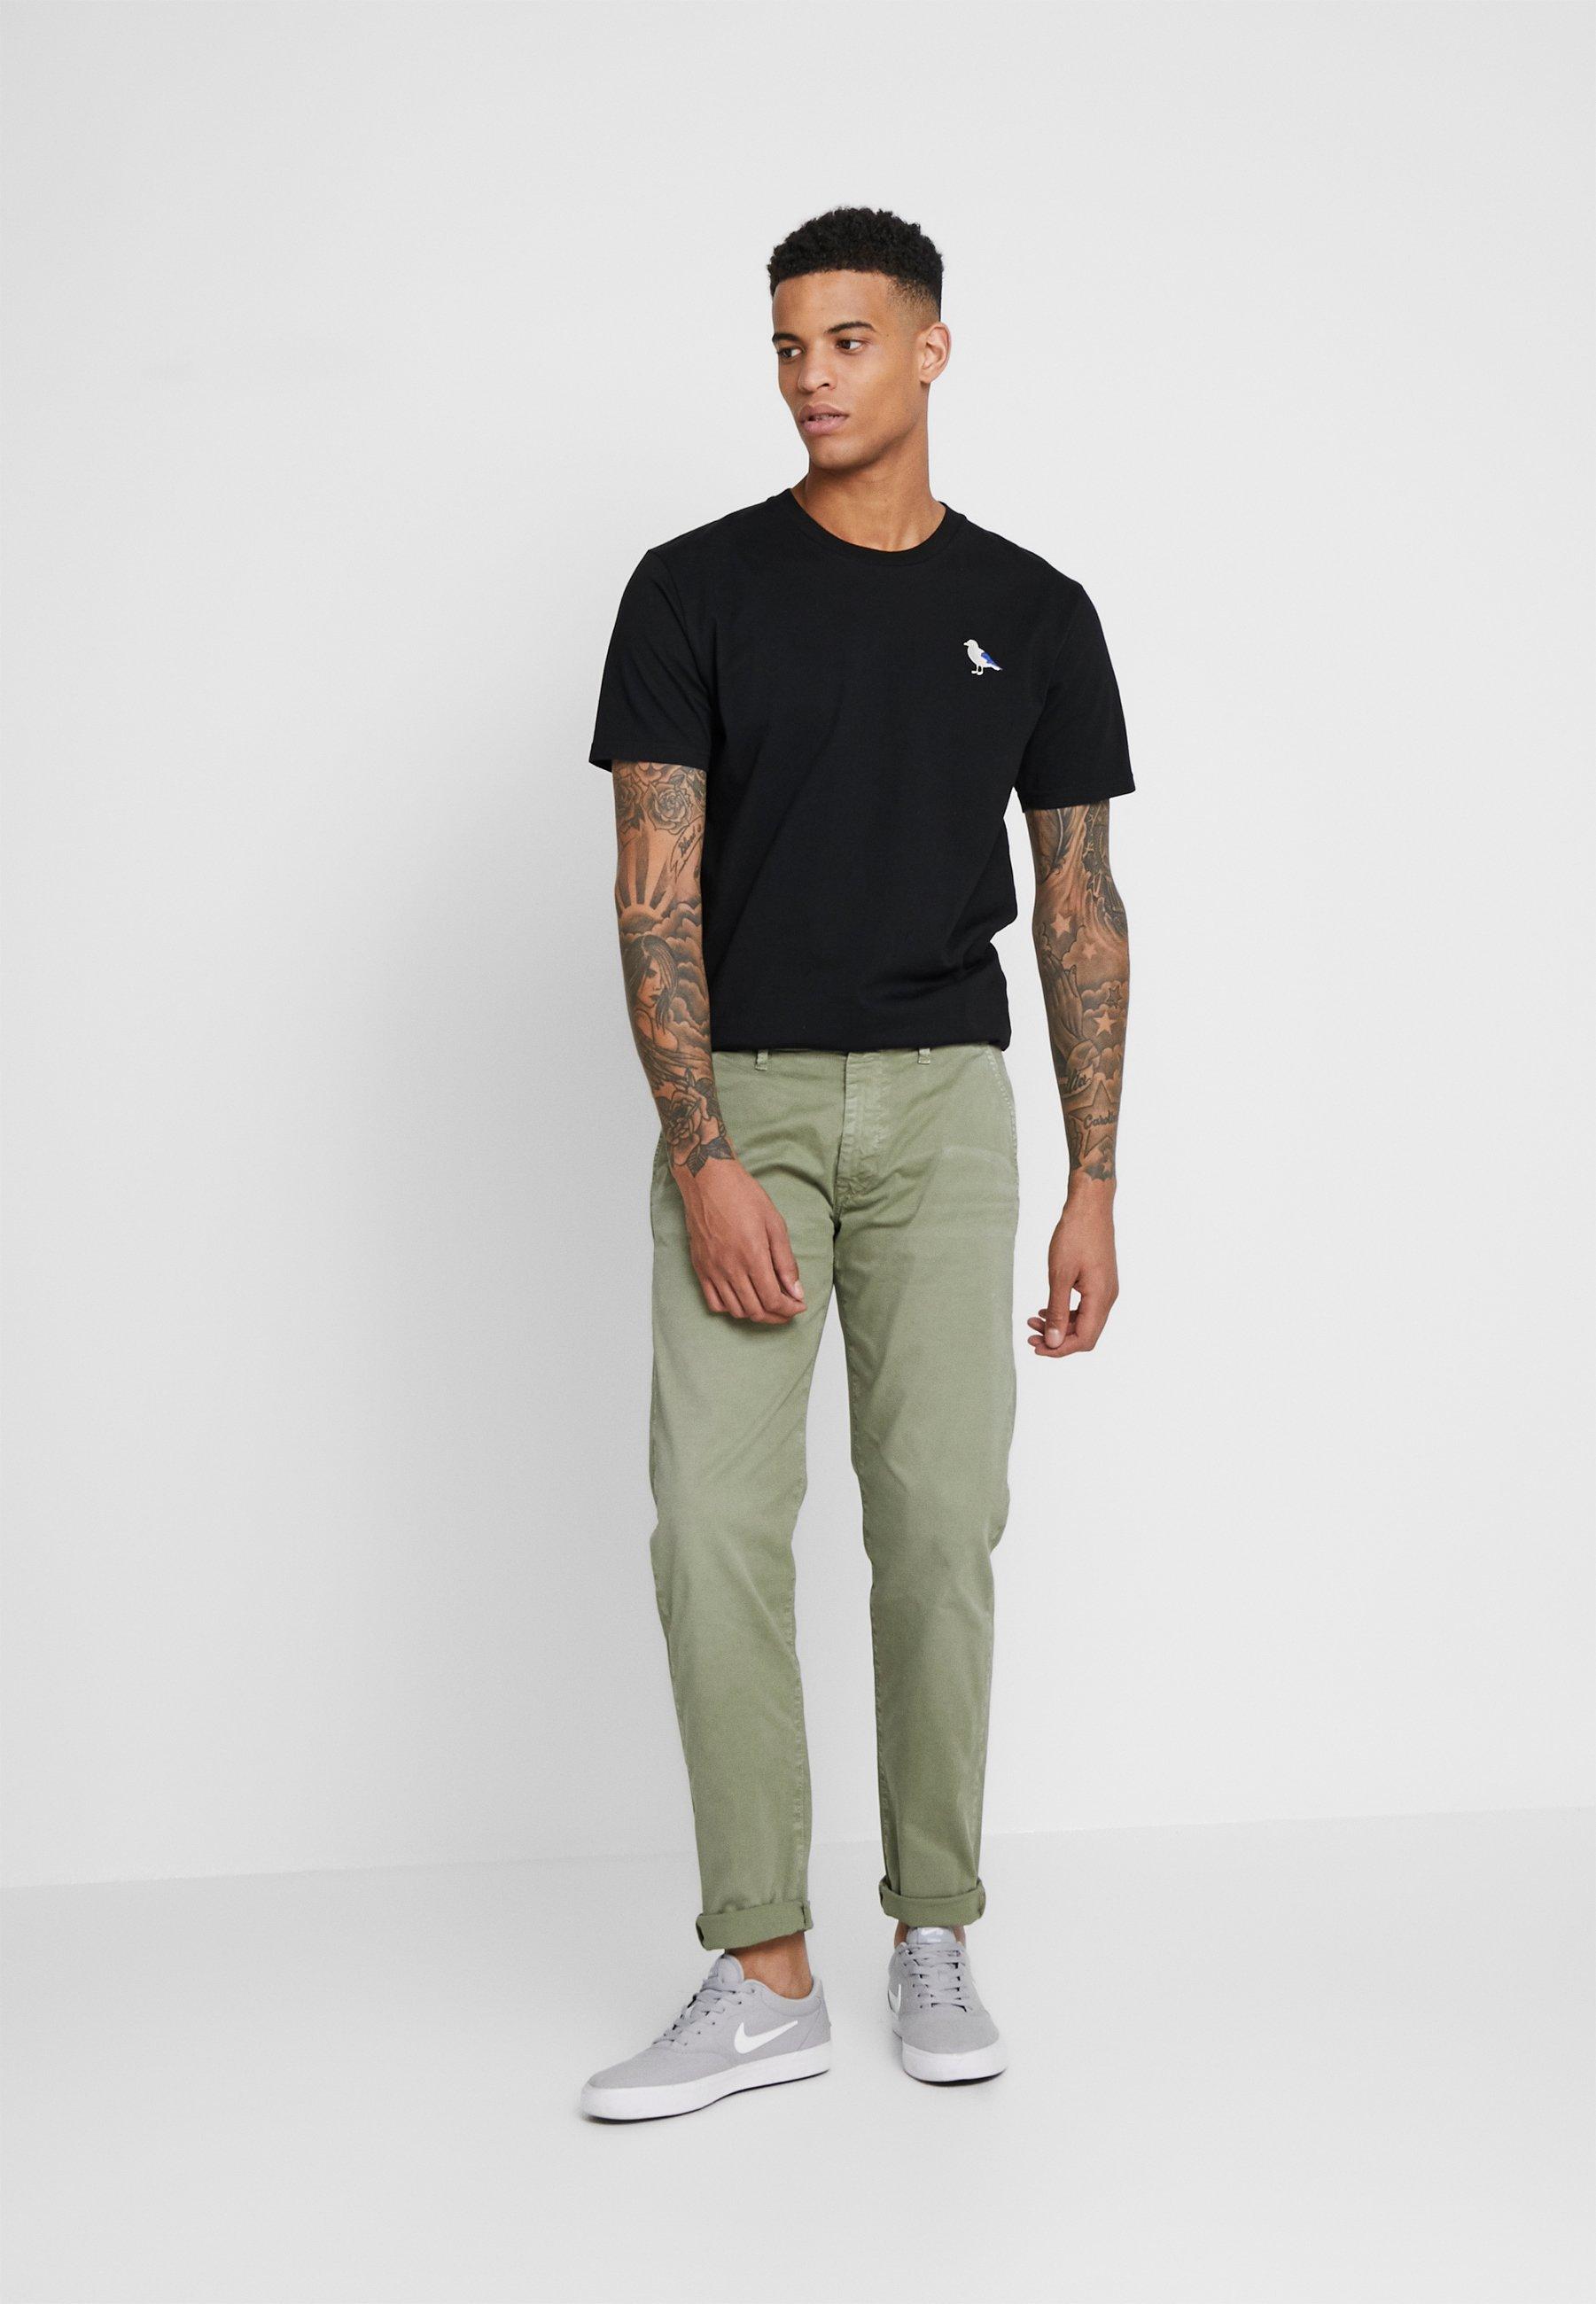 Homme EMBRO GULL - T-shirt basique